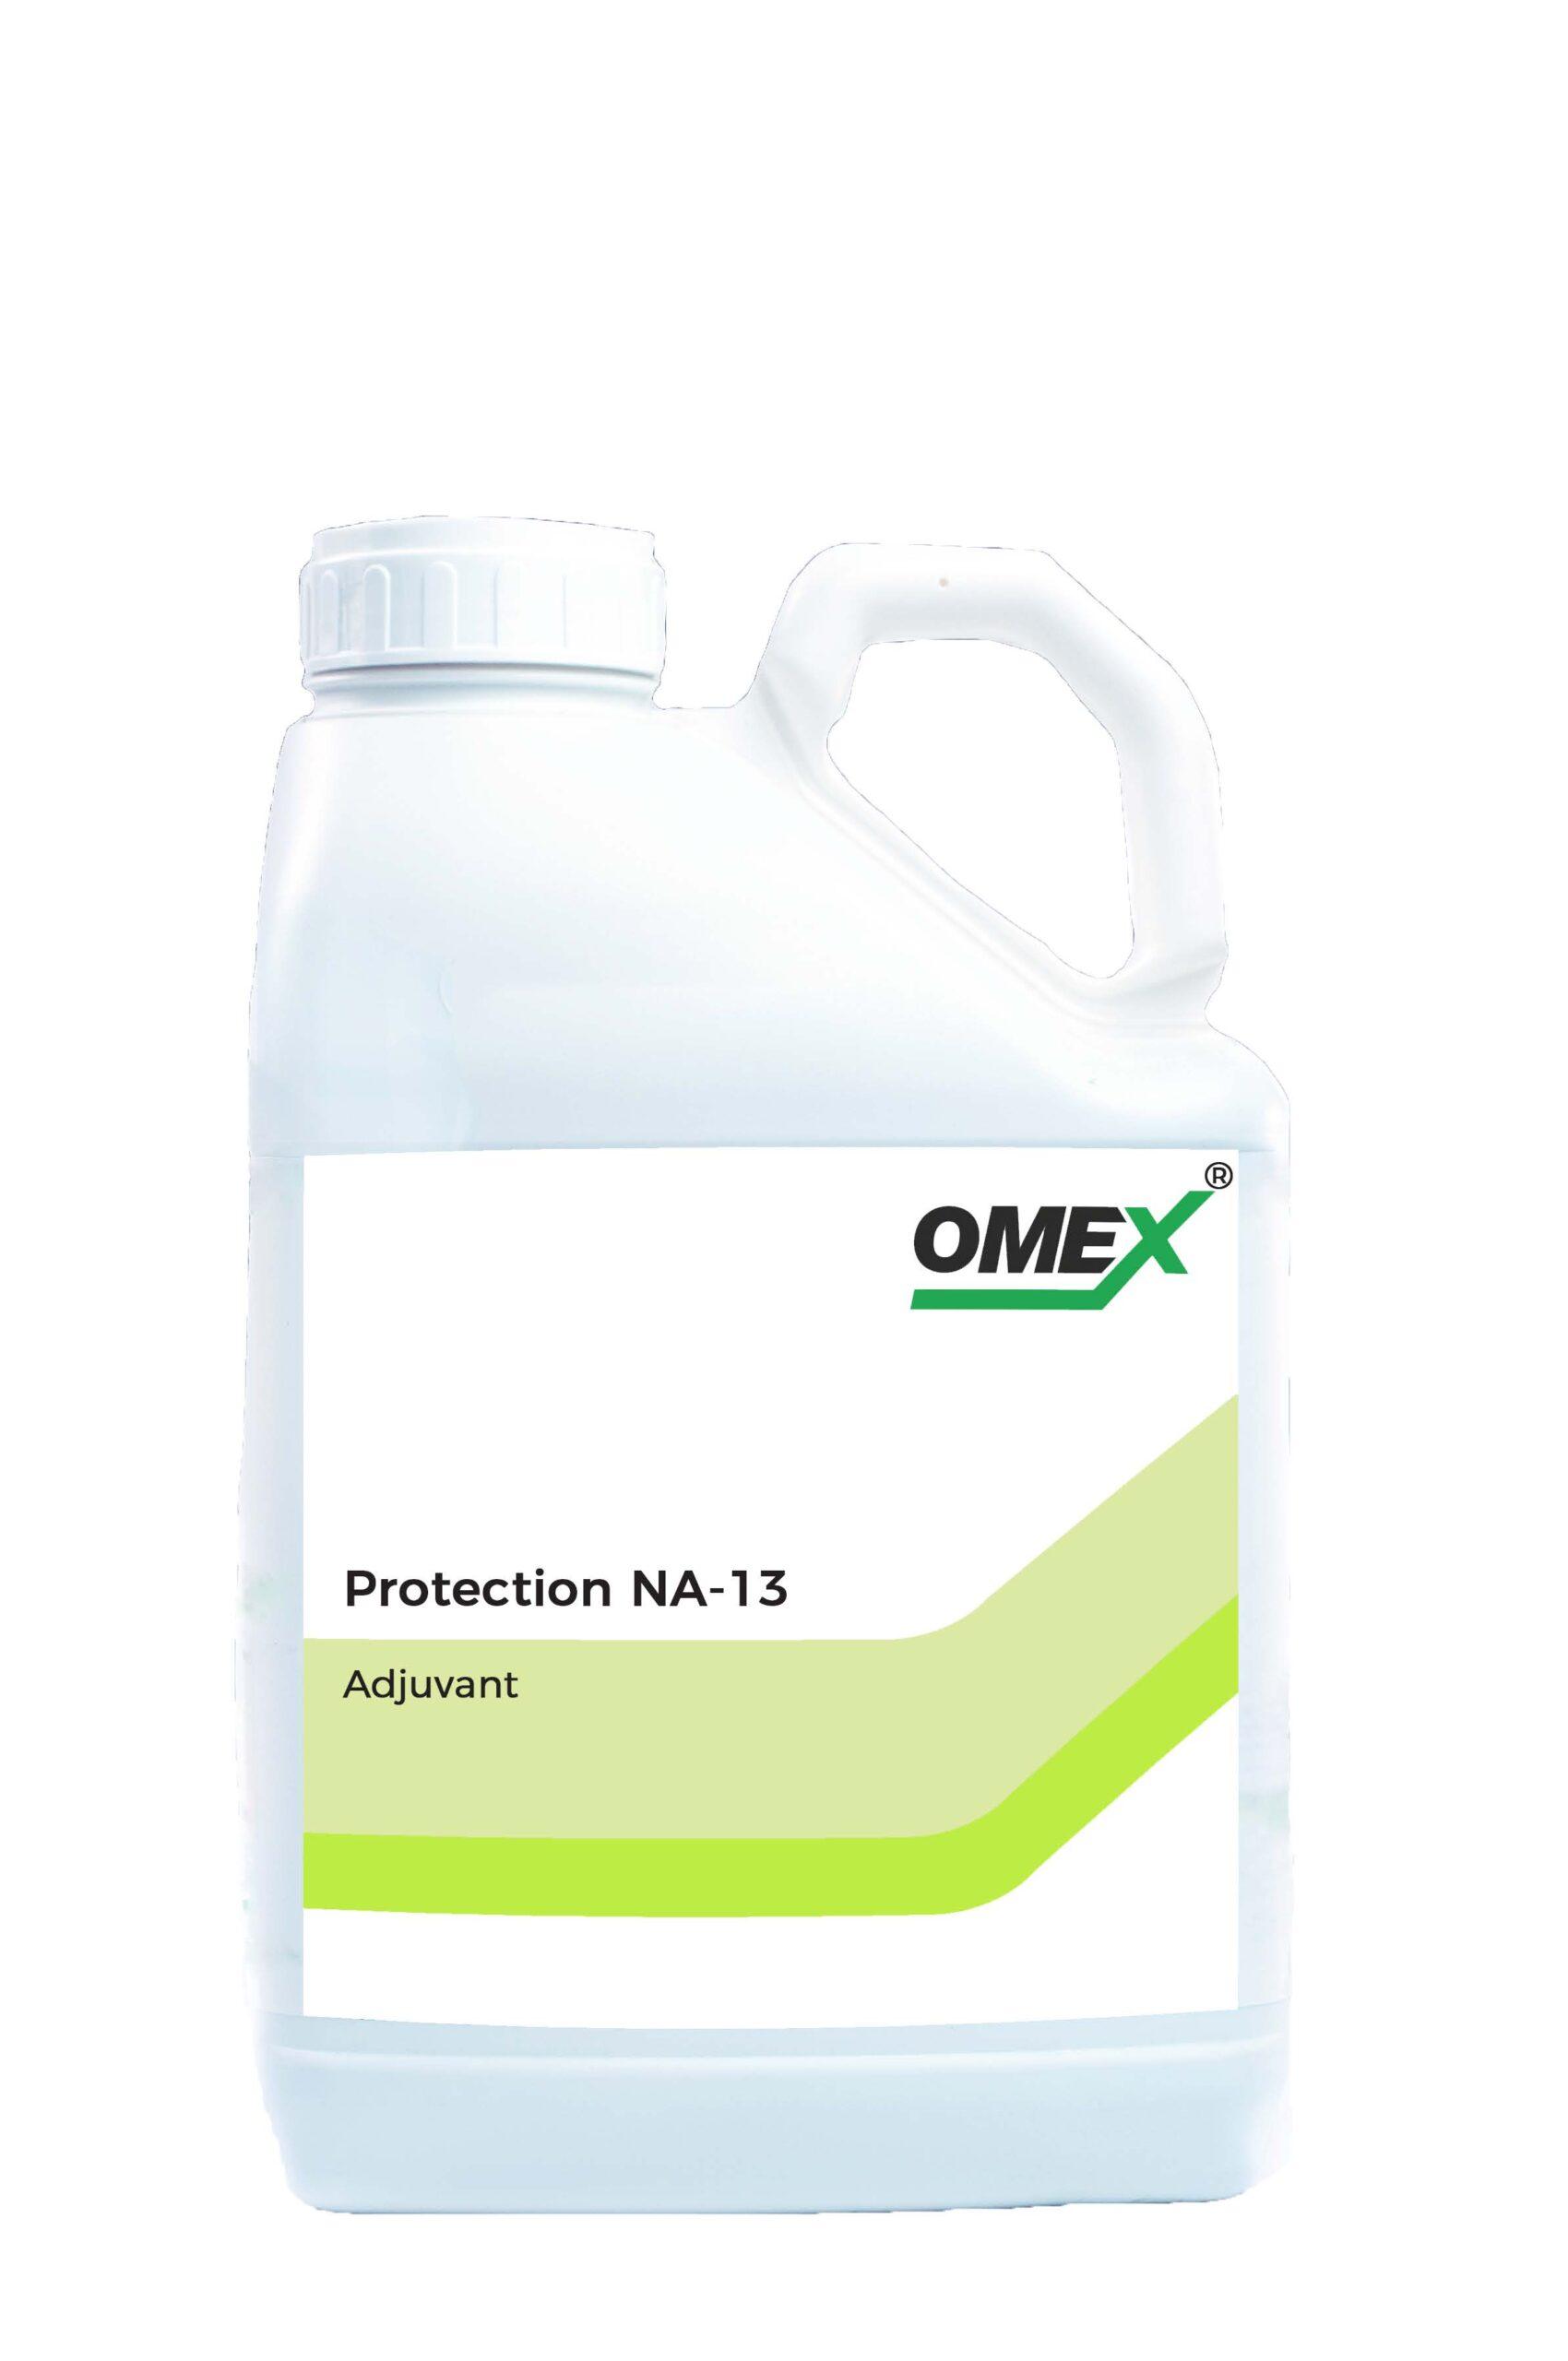 Protection Na-13